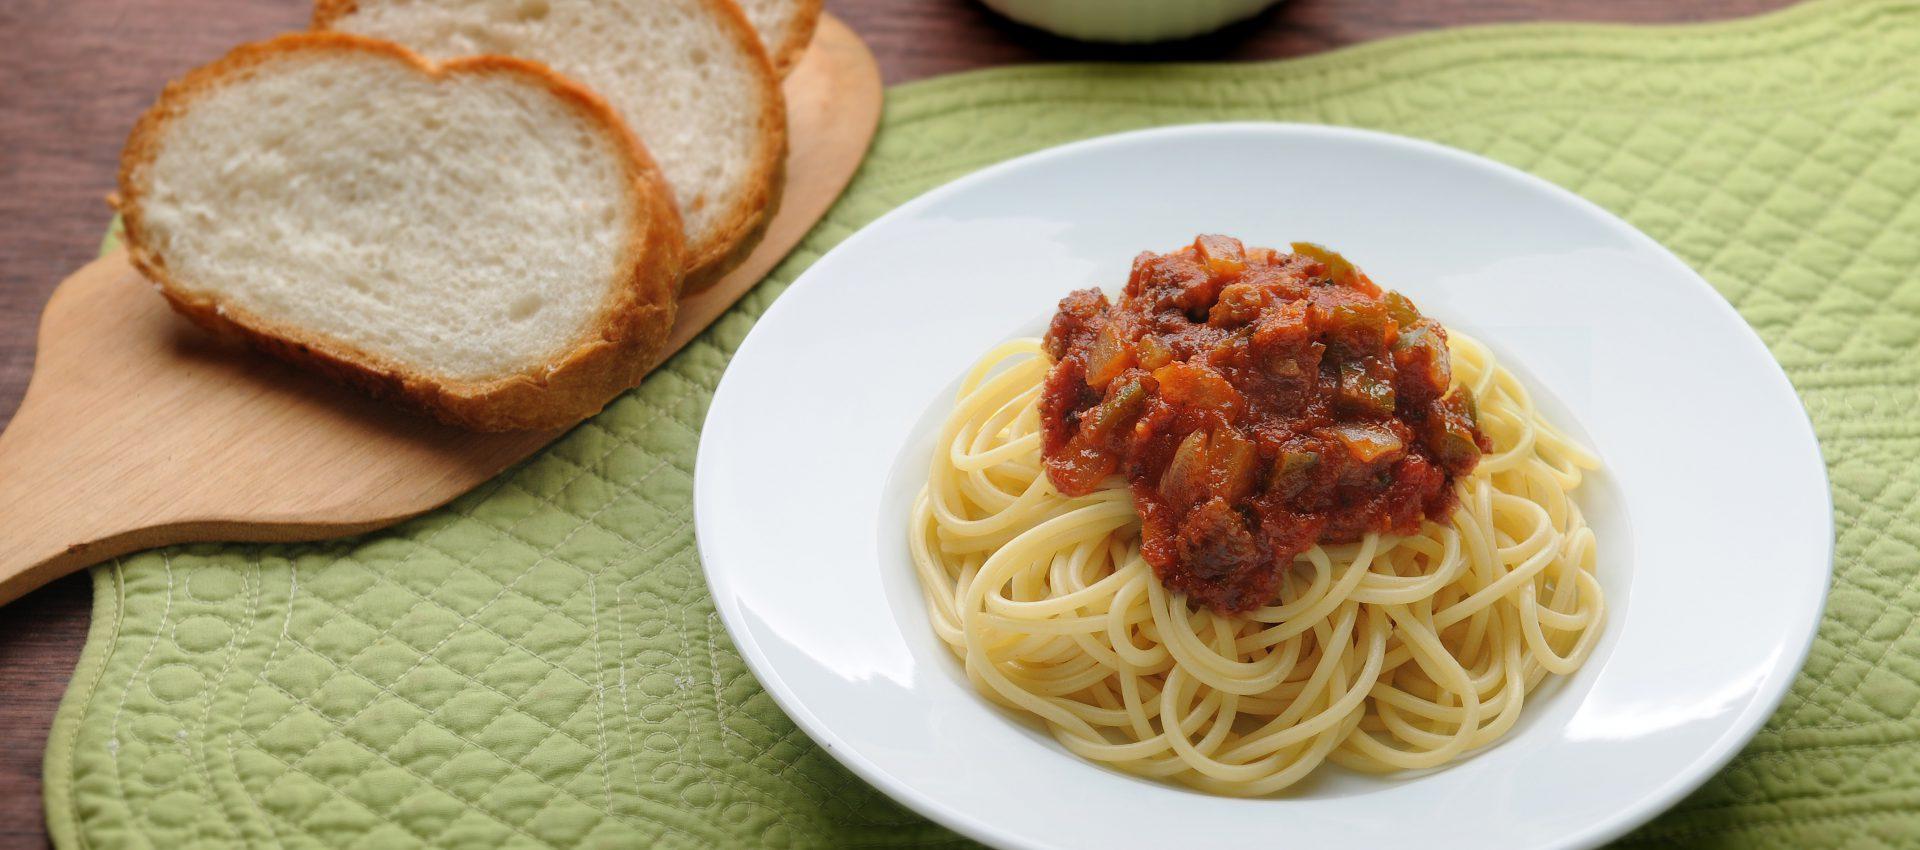 Spaghetti-Classic-Italian-Sauce-HR-1920x850 Spaghetti with Classic Italian Sauce